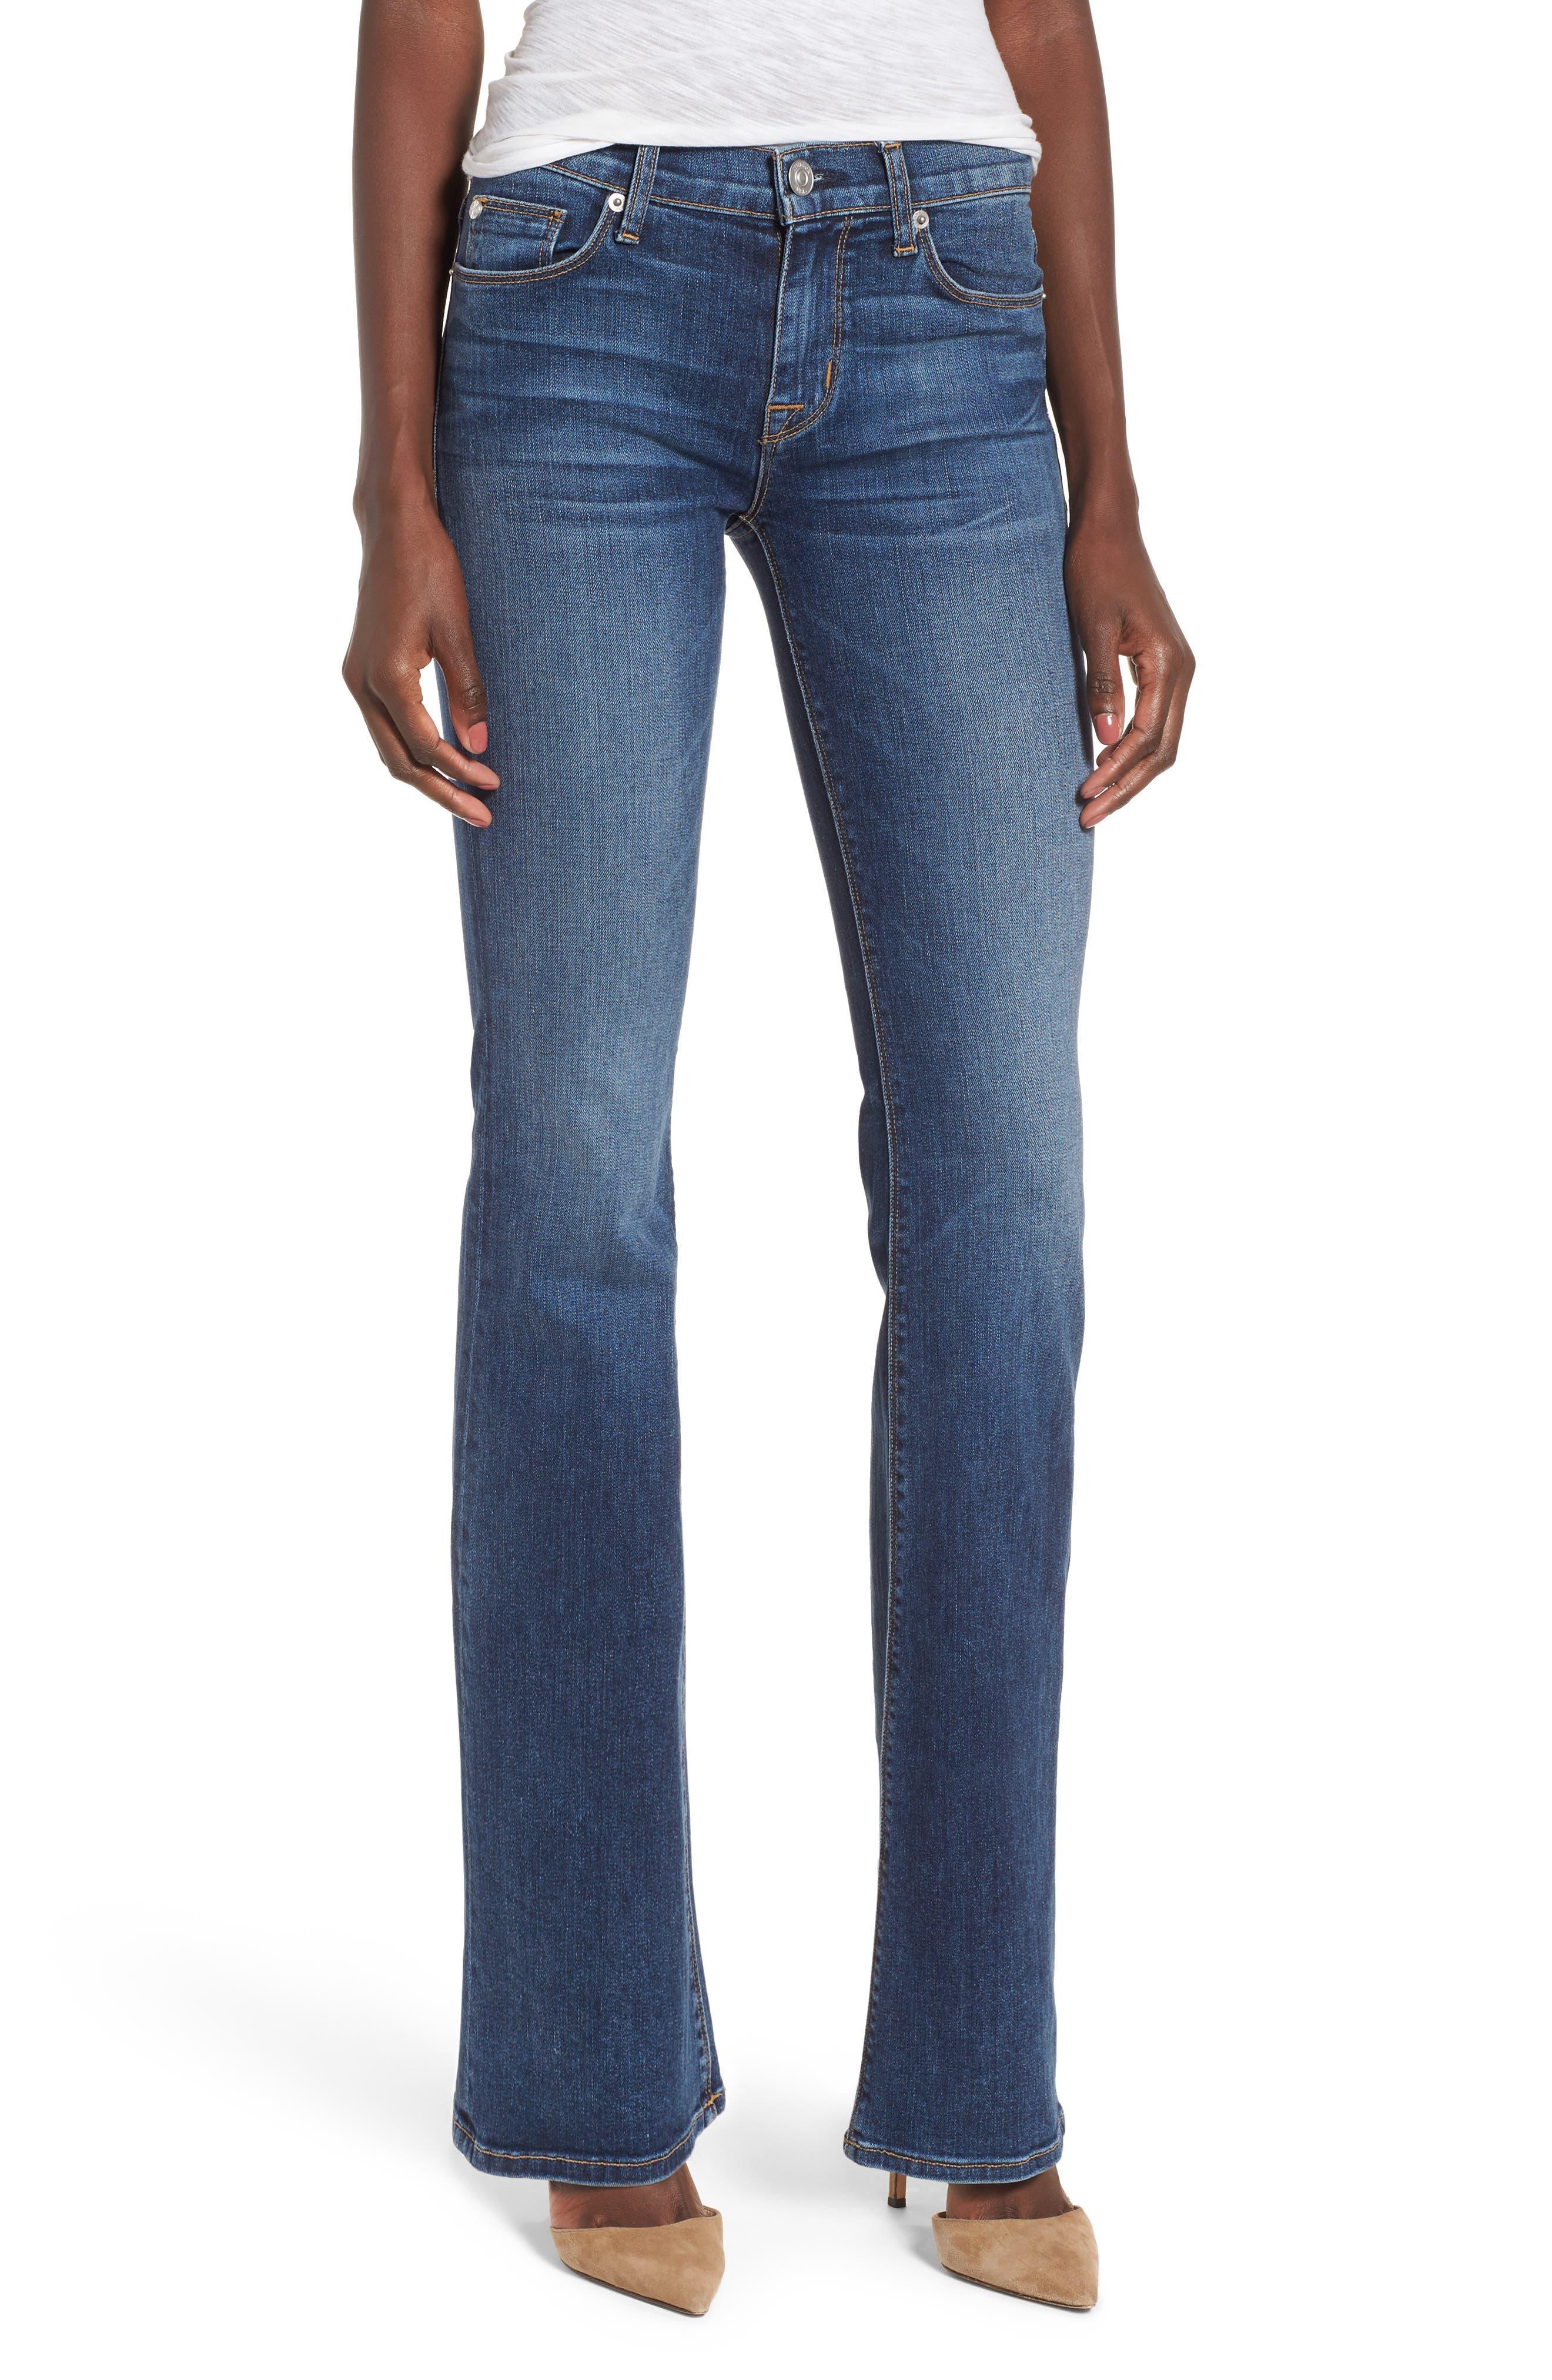 Hudson Jeans Drew Bootcut Jeans (Unfamed)